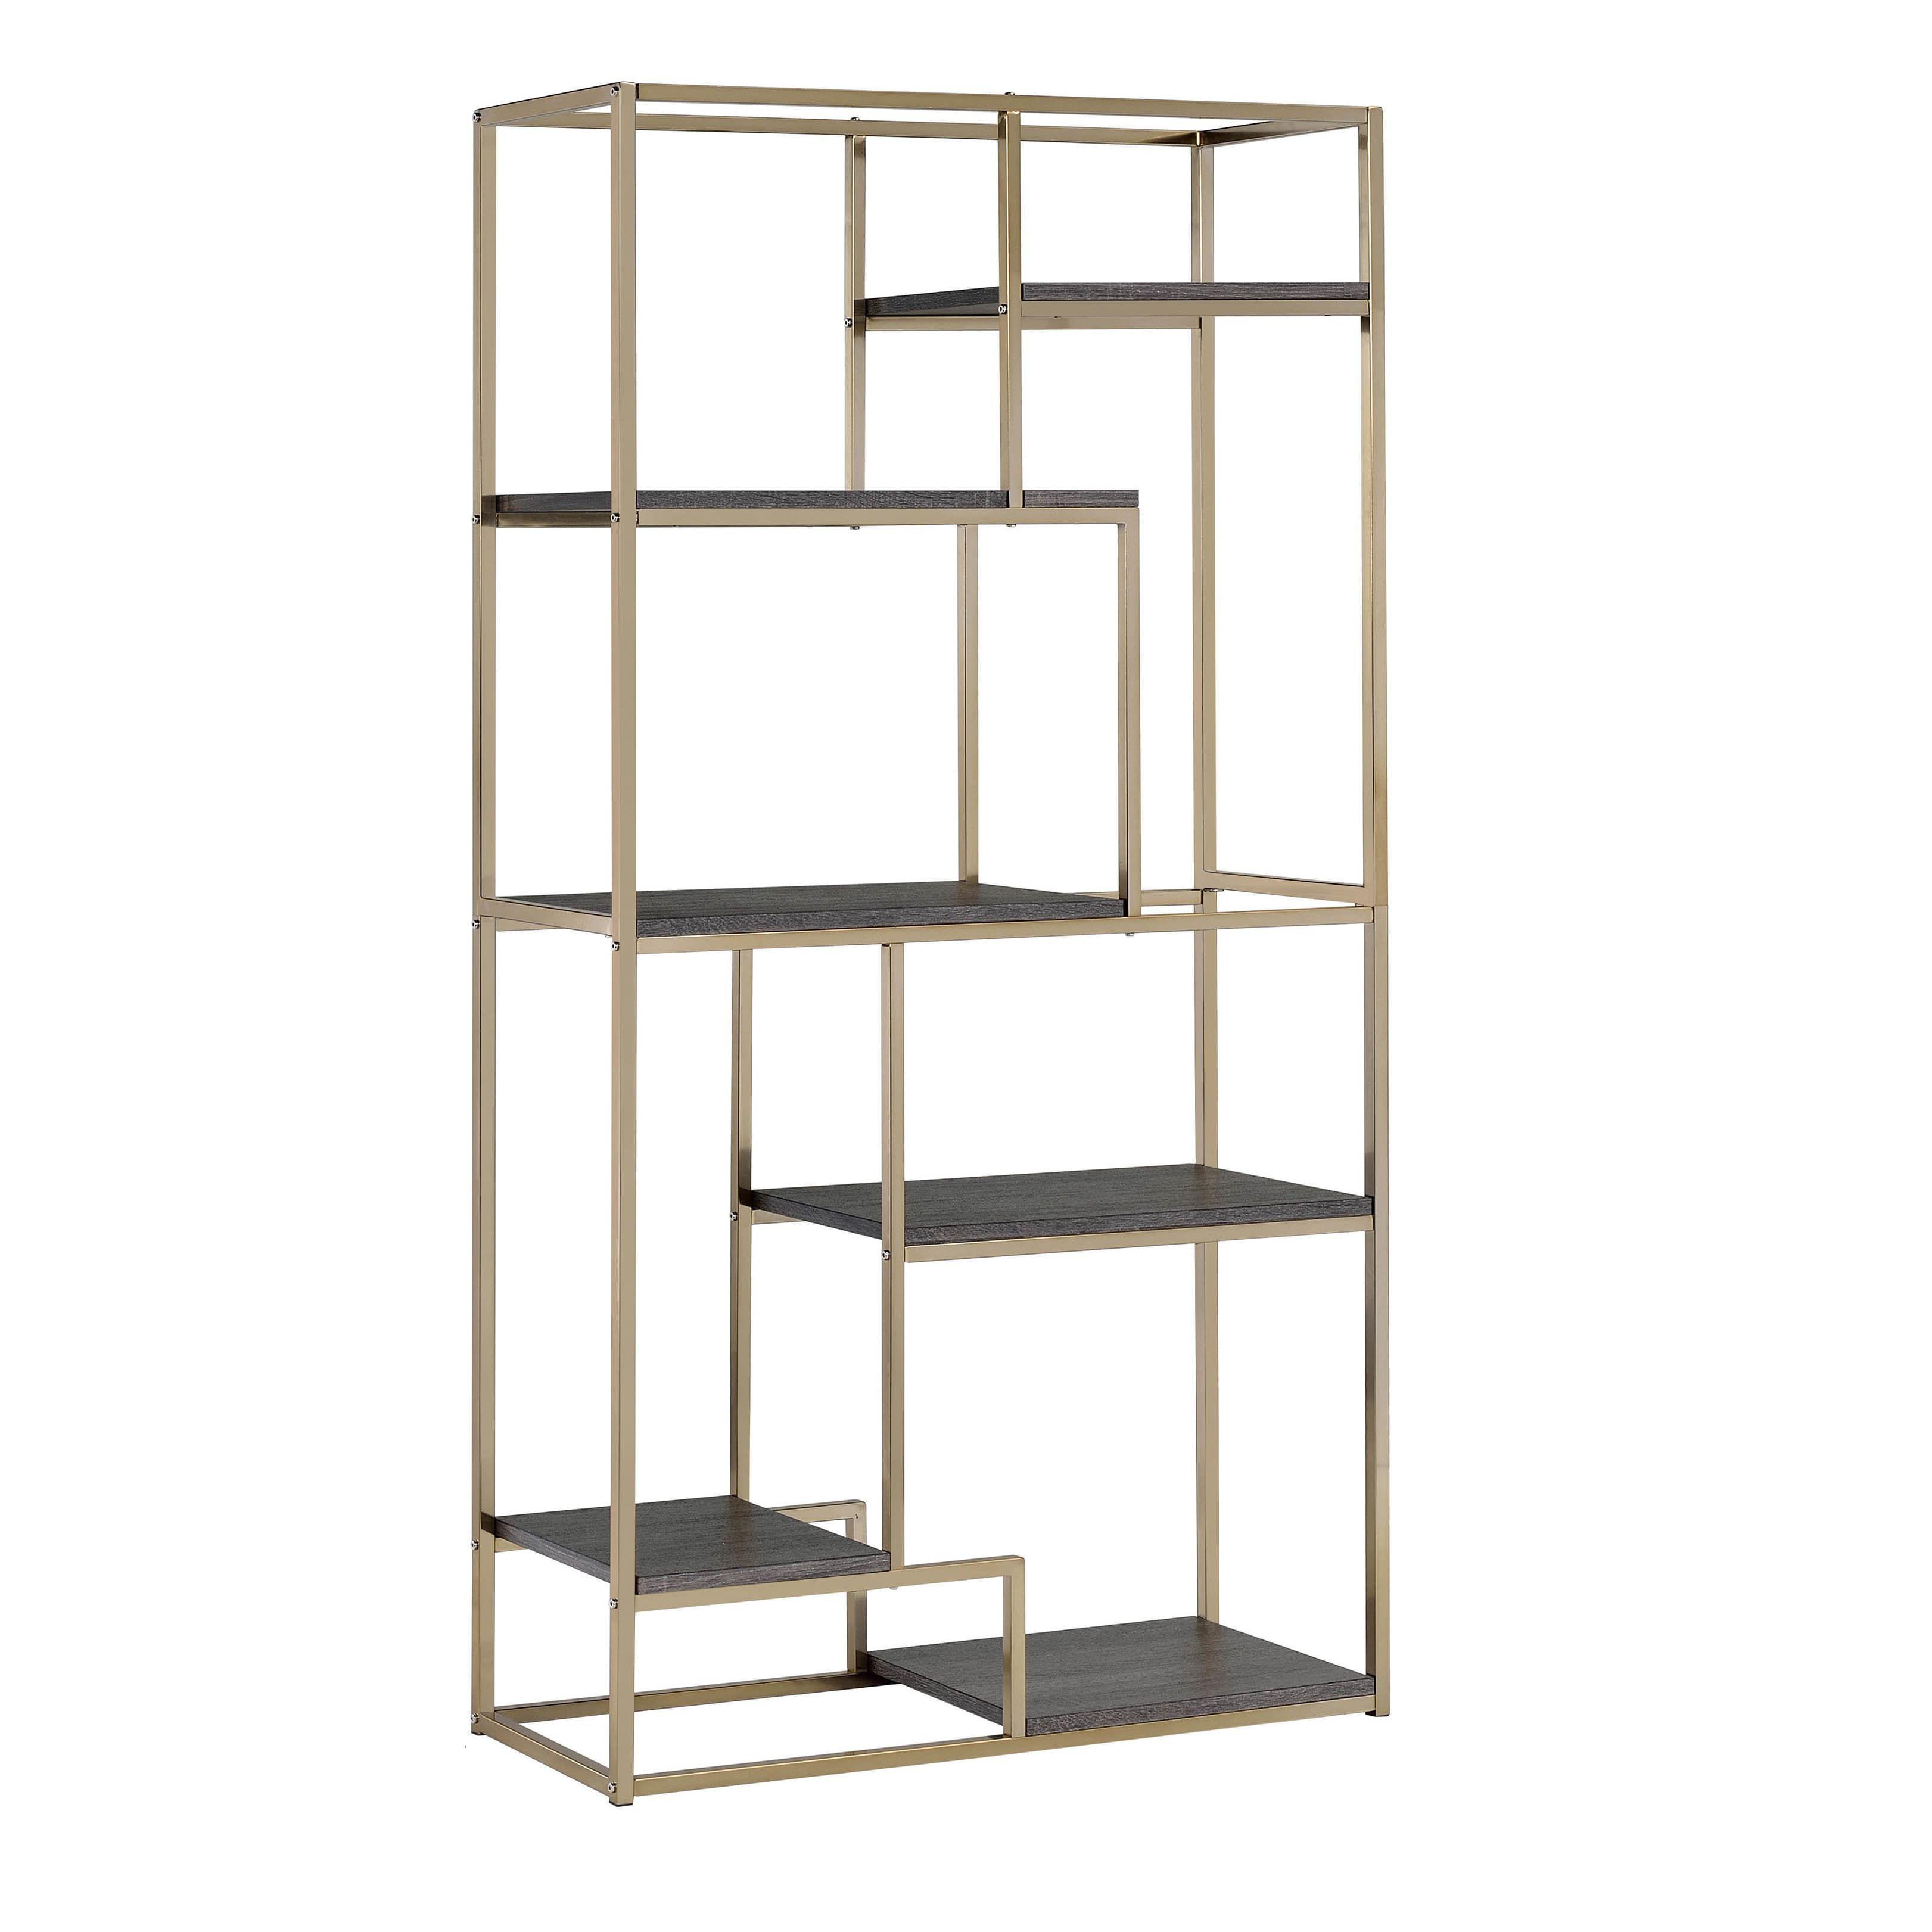 Furniture Of America Nara Contemporary 6 Shelf Tiered Open Bookcase    Overstock.com Shopping